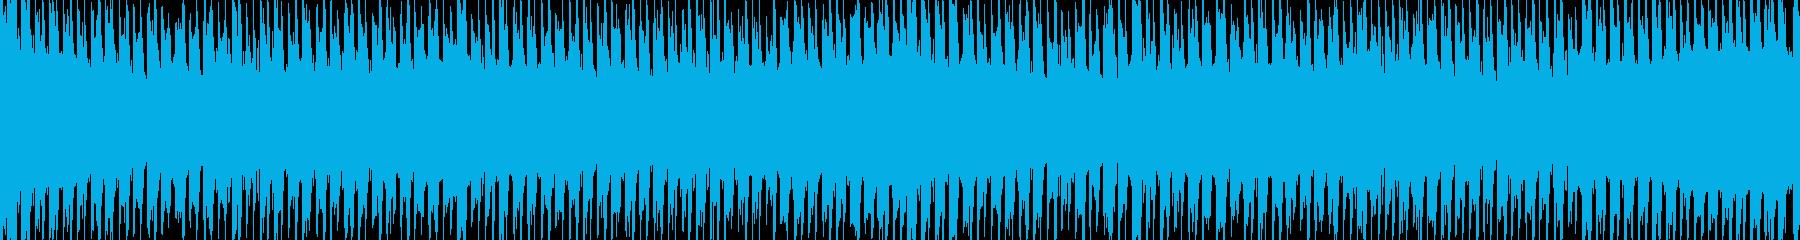 【EDMループ素材】企業・映像制作向きHの再生済みの波形